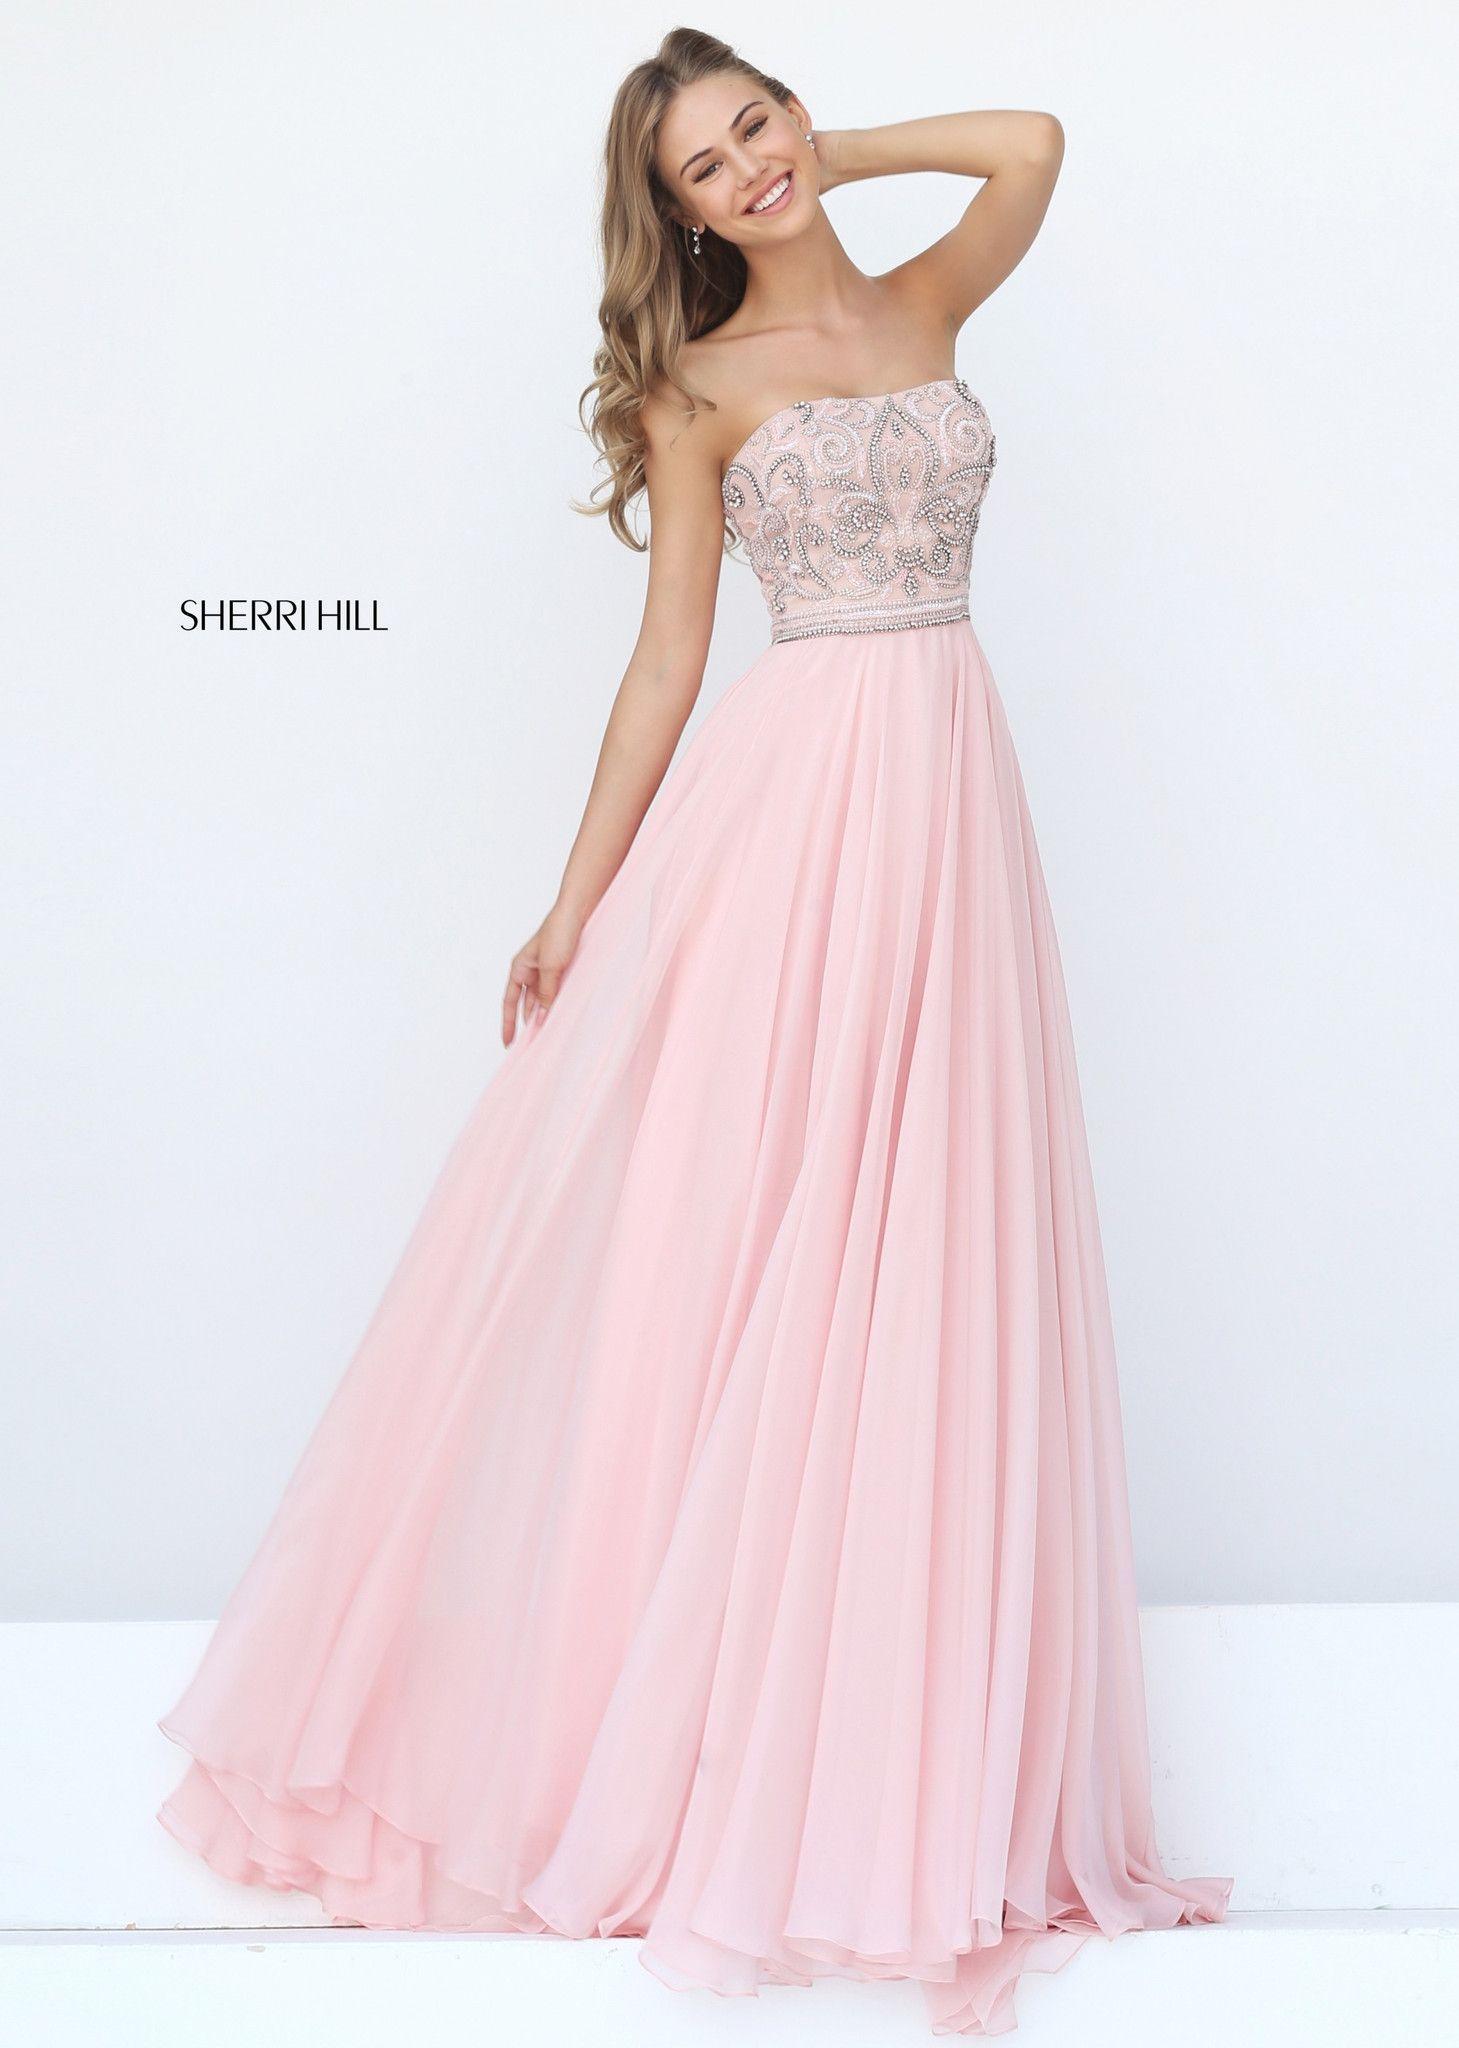 Sherri Hill Prom Dress Style 11179 Fashion Vestidos